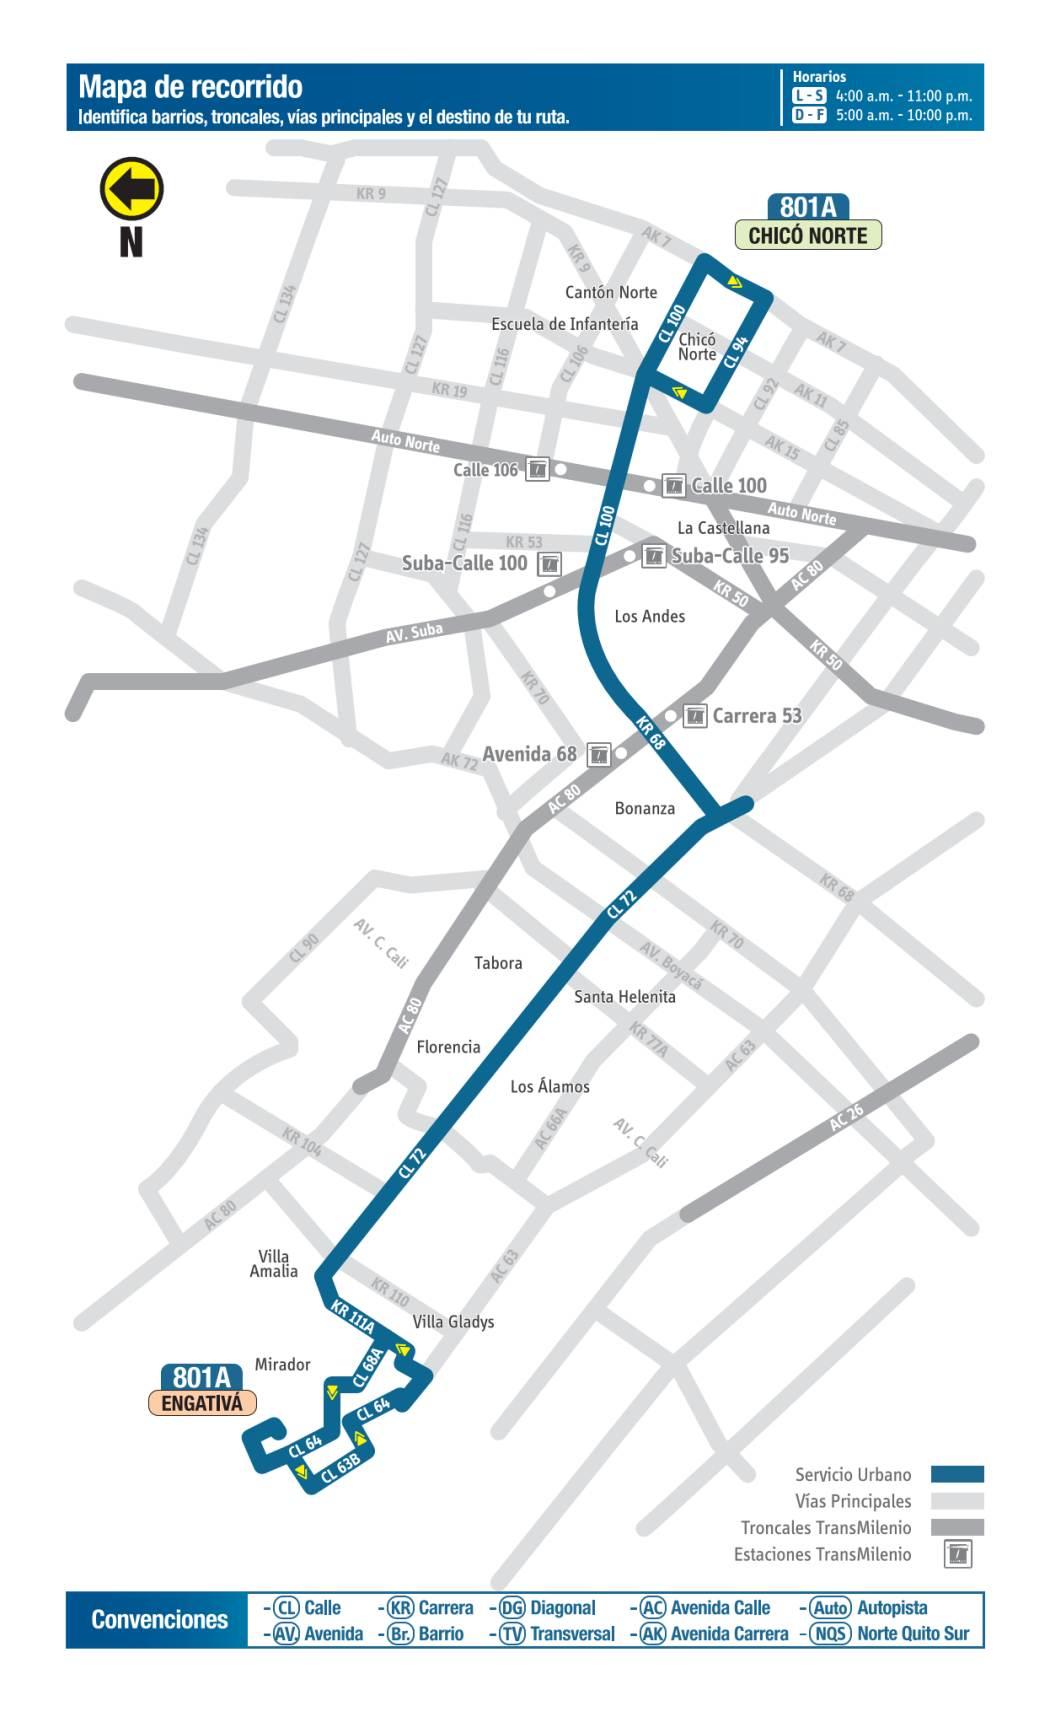 801A Chico Norte - Engativá, mapa bus urbano Bogotá